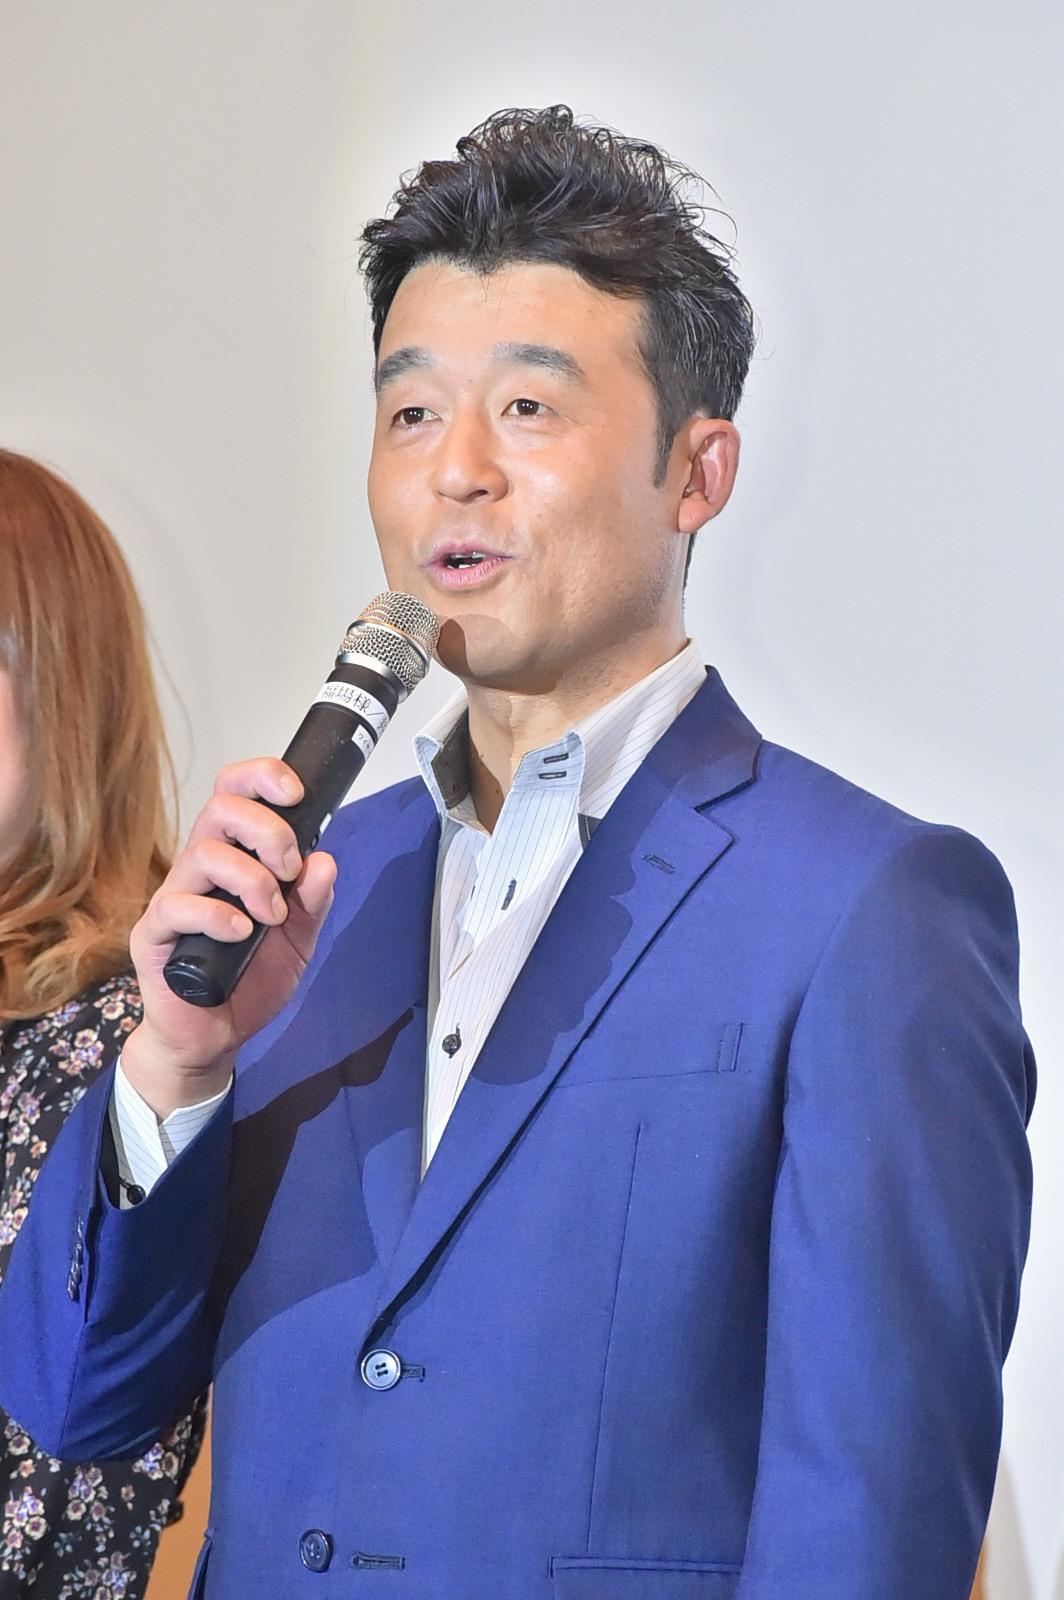 http://news.yoshimoto.co.jp/20190115124328-8086617be4a776d965f9cc6271f08278665face5.jpg